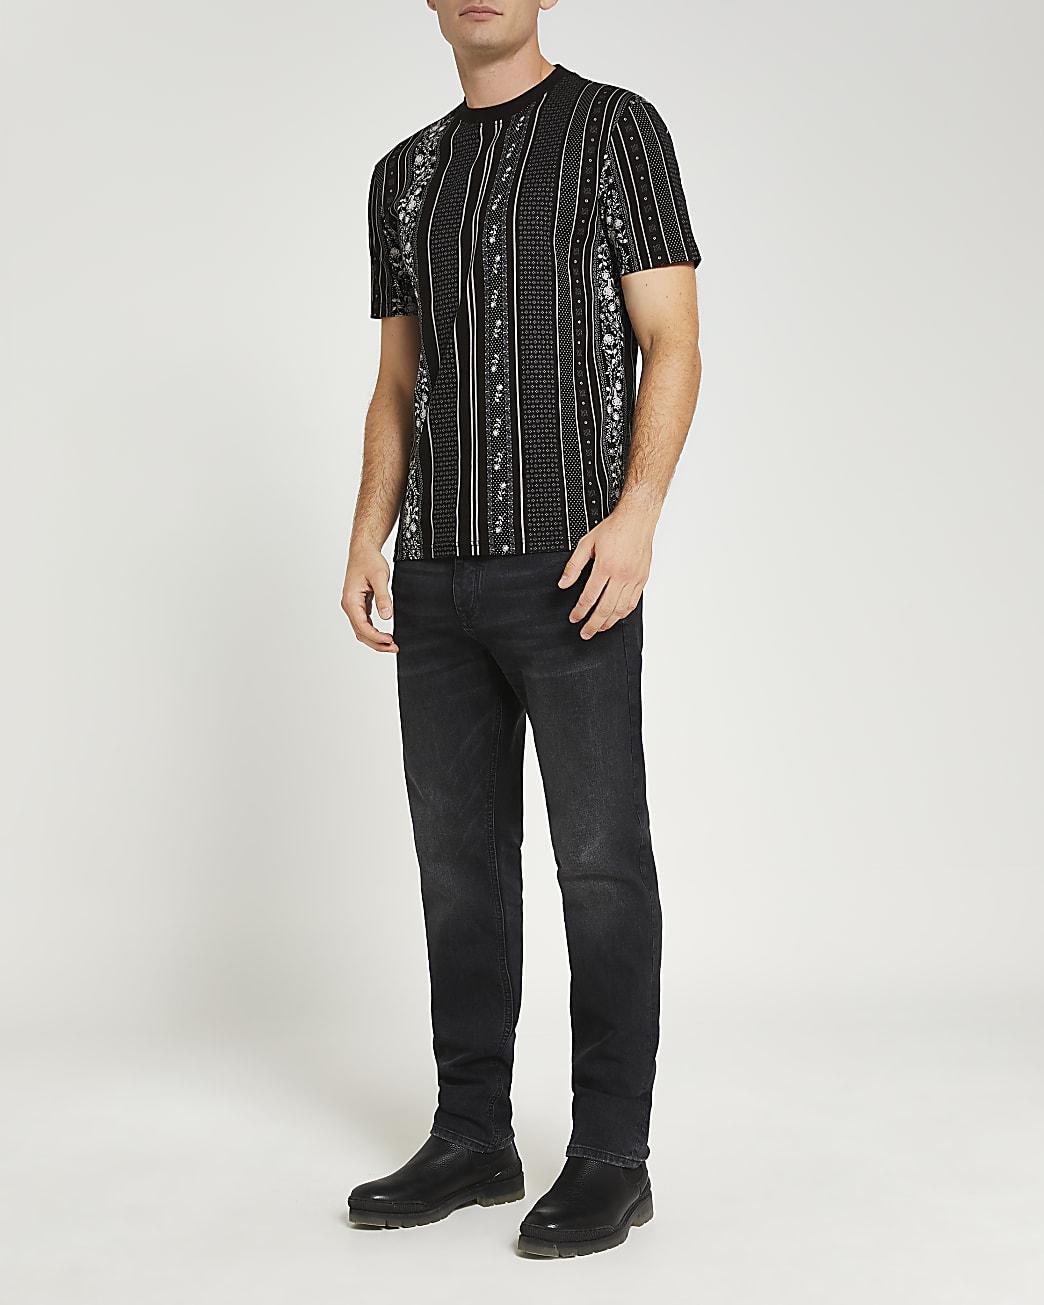 Black slim fit floral stripe t-shirt